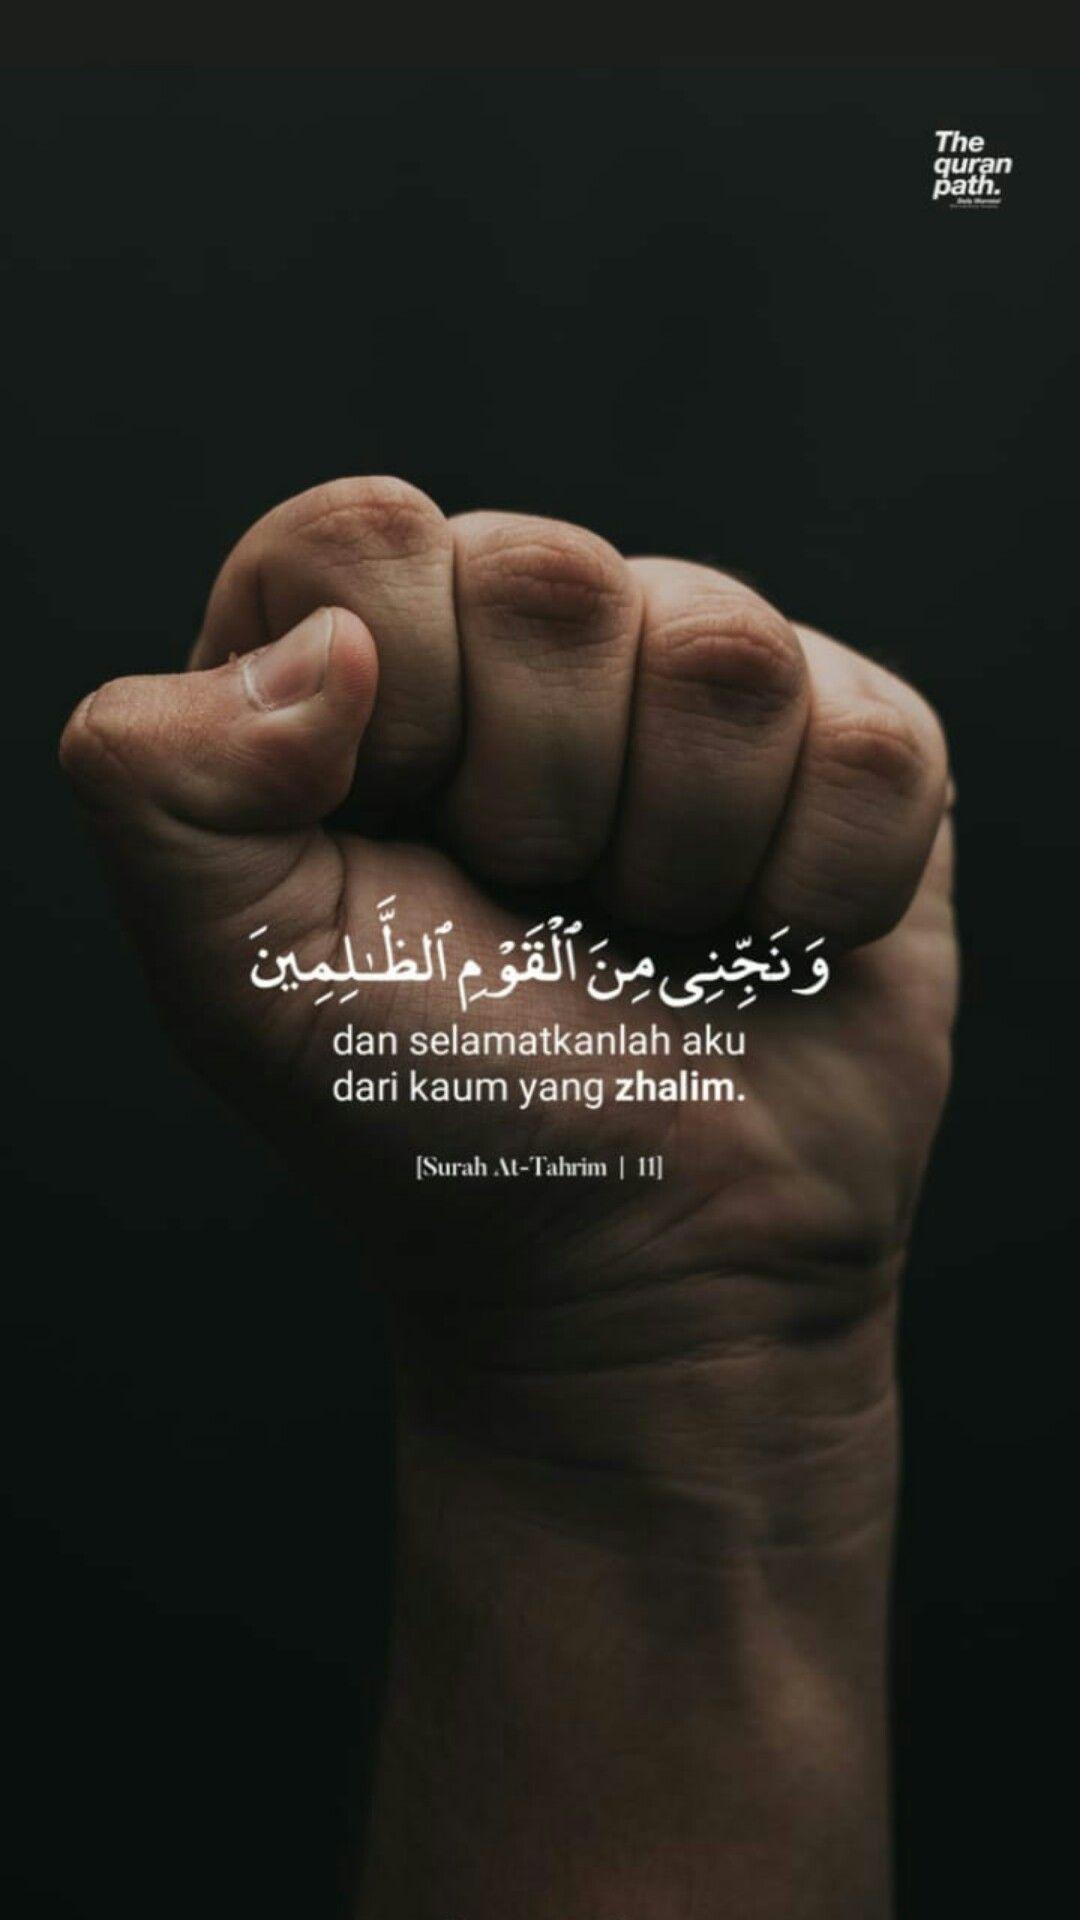 Kata Mutiara Dari Al Quran : mutiara, quran, Aleya, Nadhirah, Zulkifli, AL-QUR'AN, Kutipan, Bijak,, Pelajaran, Hidup,, Kata-kata, Indah